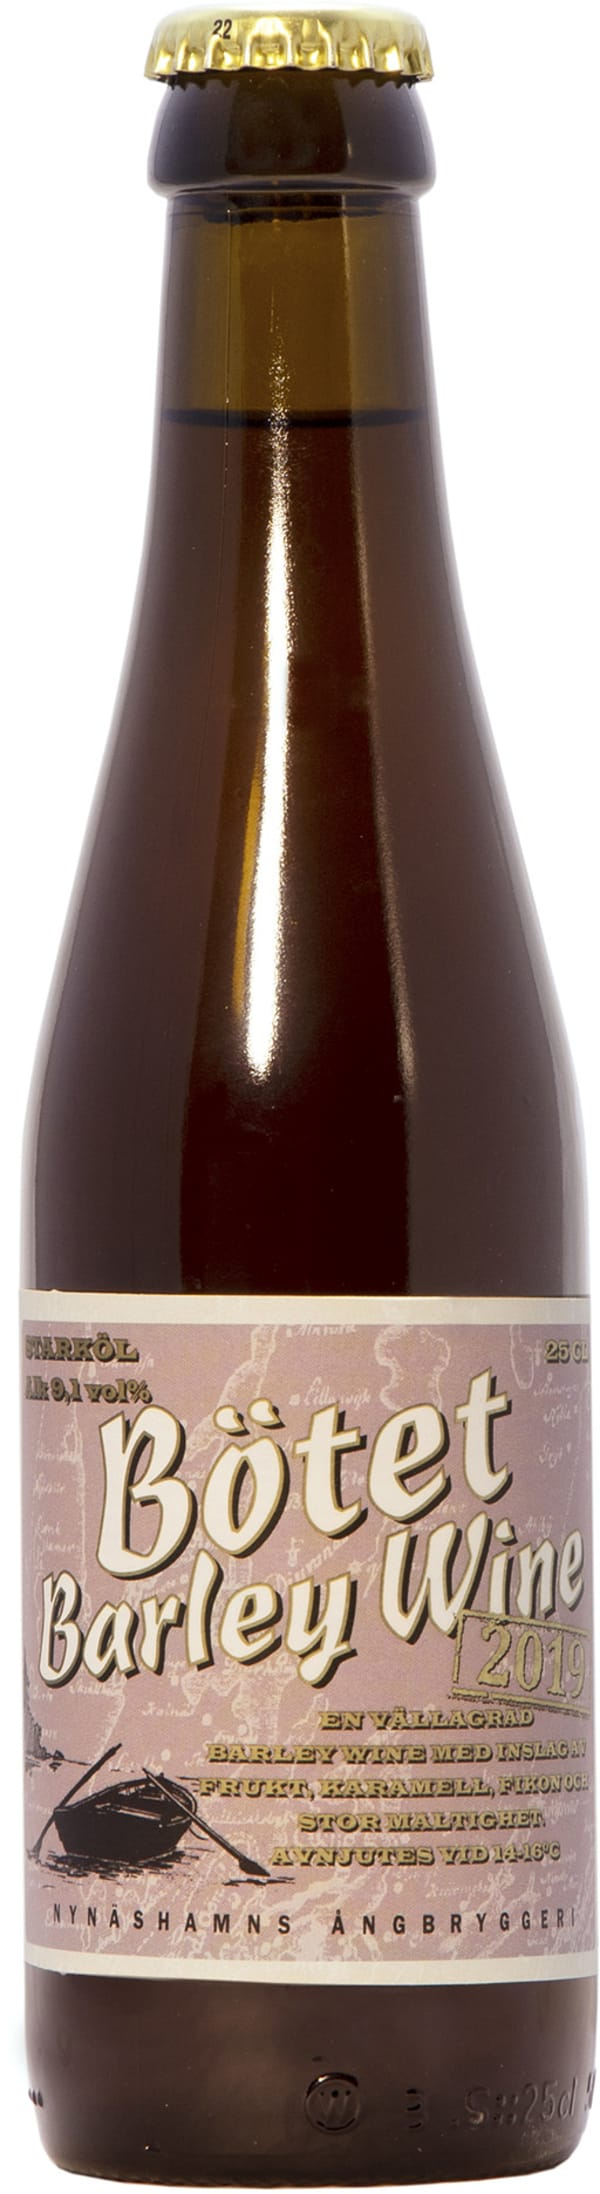 Nynäshamns Bötet Barley Wine